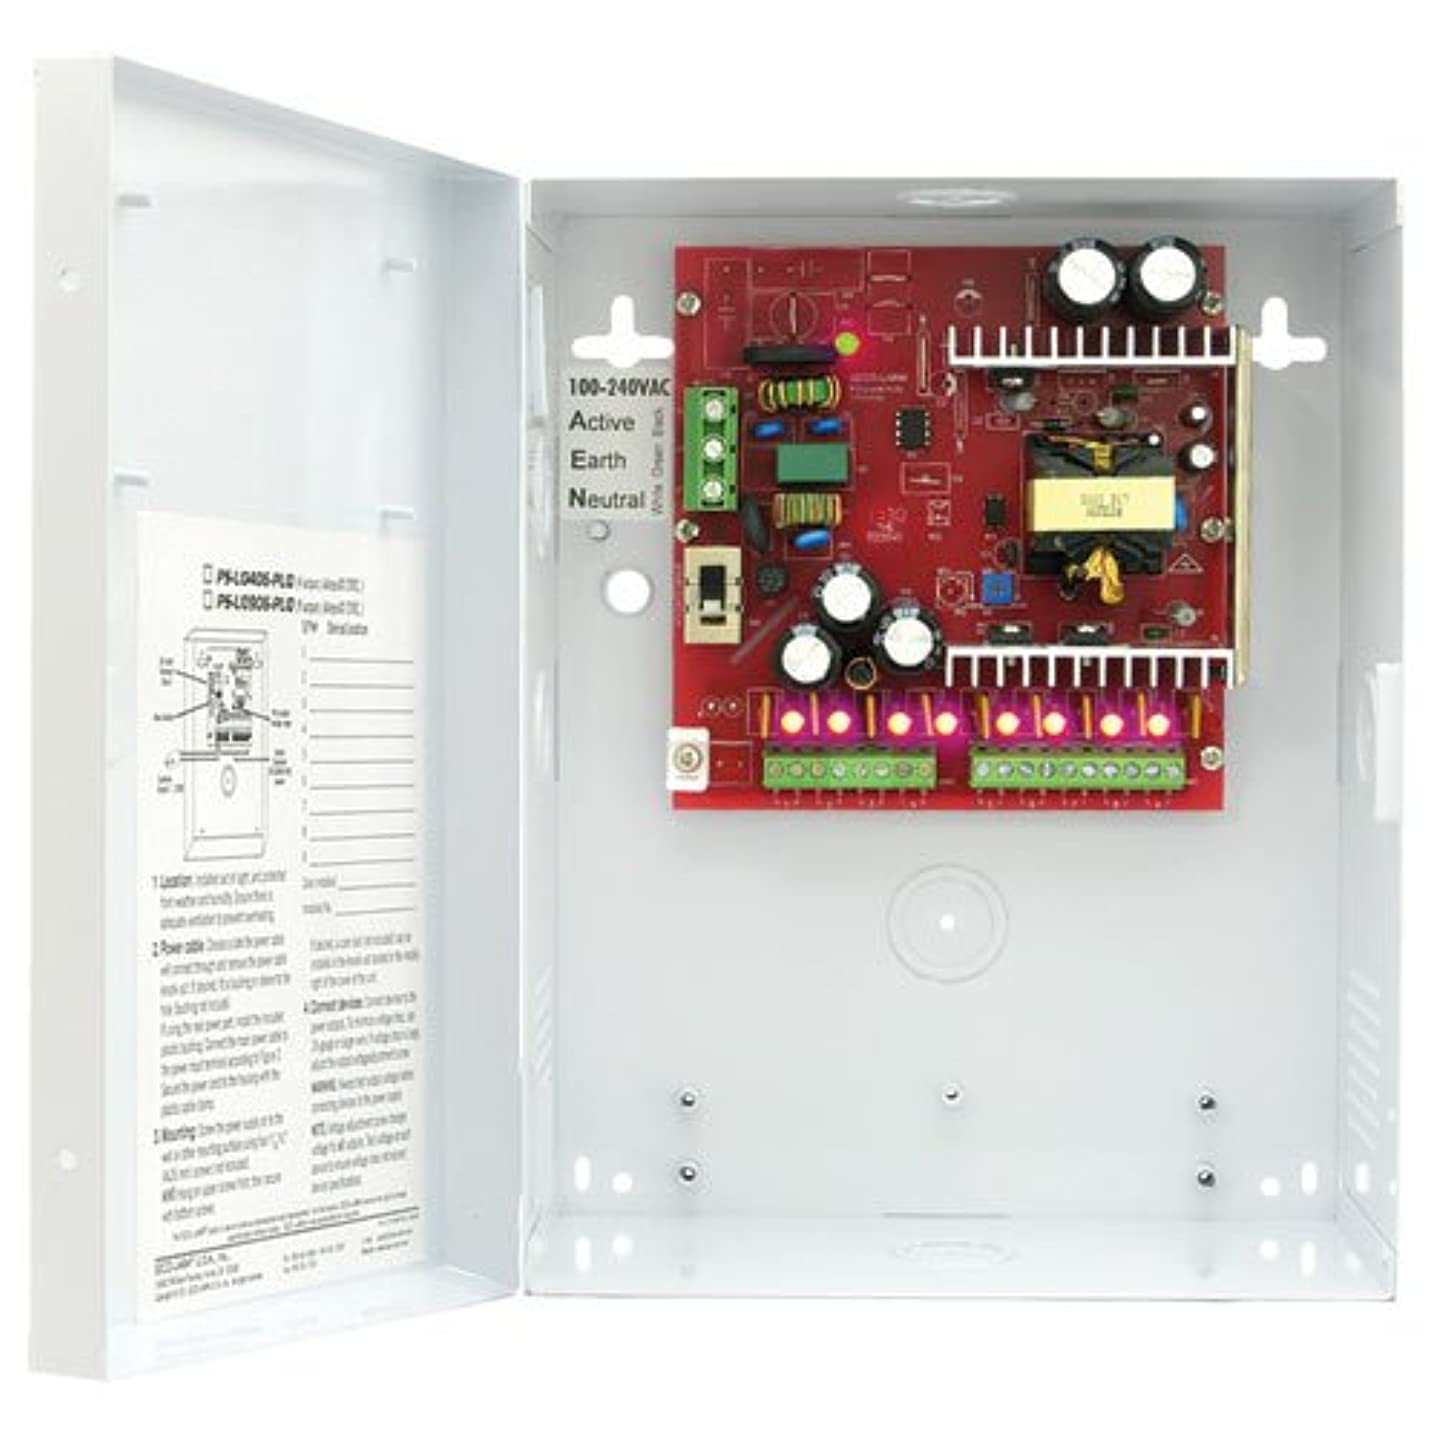 Seco-Larm PS-U0906-PULQ 12VDC Switching CCTV Power Supply; Universal 100~240 VAC Input; New Lightweight, Cost-effective Design; Each Output Individually Fused (PTC-type Fuses) shlolfeek